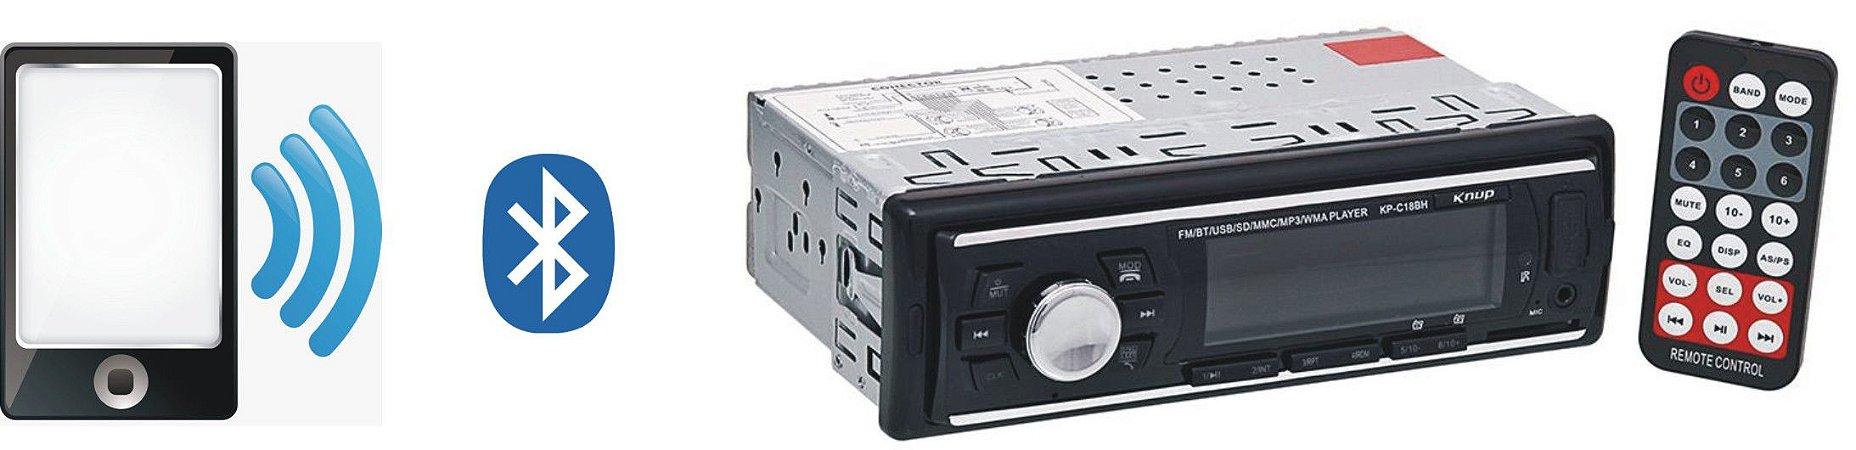 RADIO AUTOMOTIVO BLUETOOTH KNUP KP-C18BH